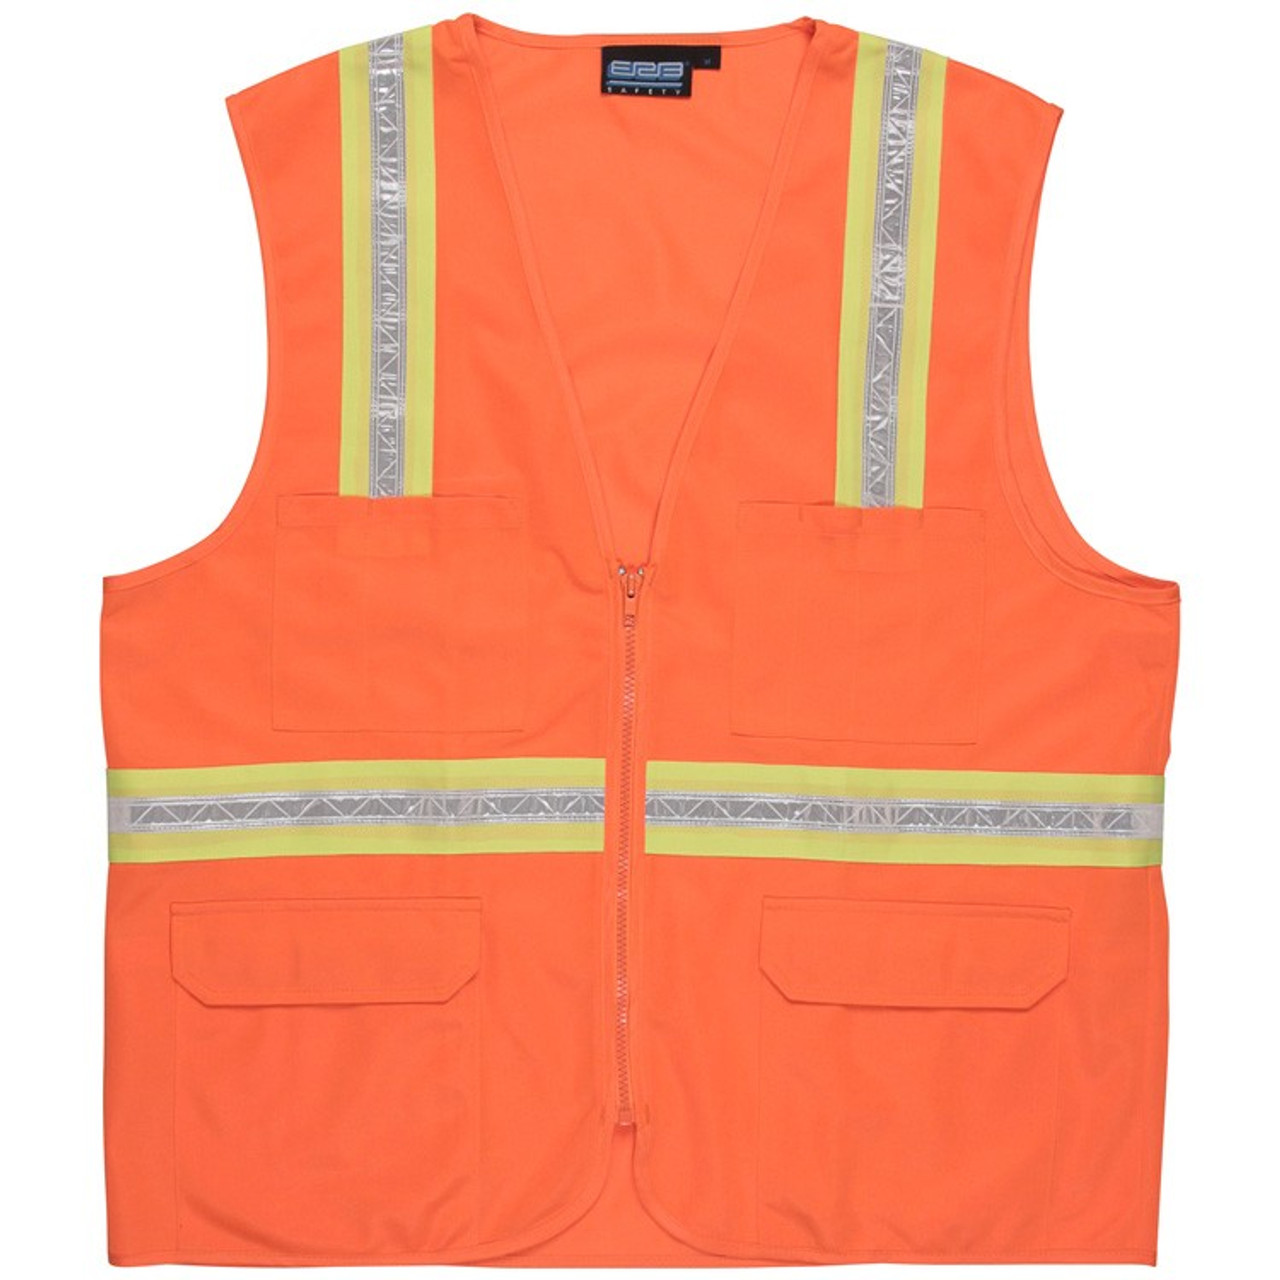 ERB 61750 S103 Non-ANSI Surveyors Vest X-Large Orange